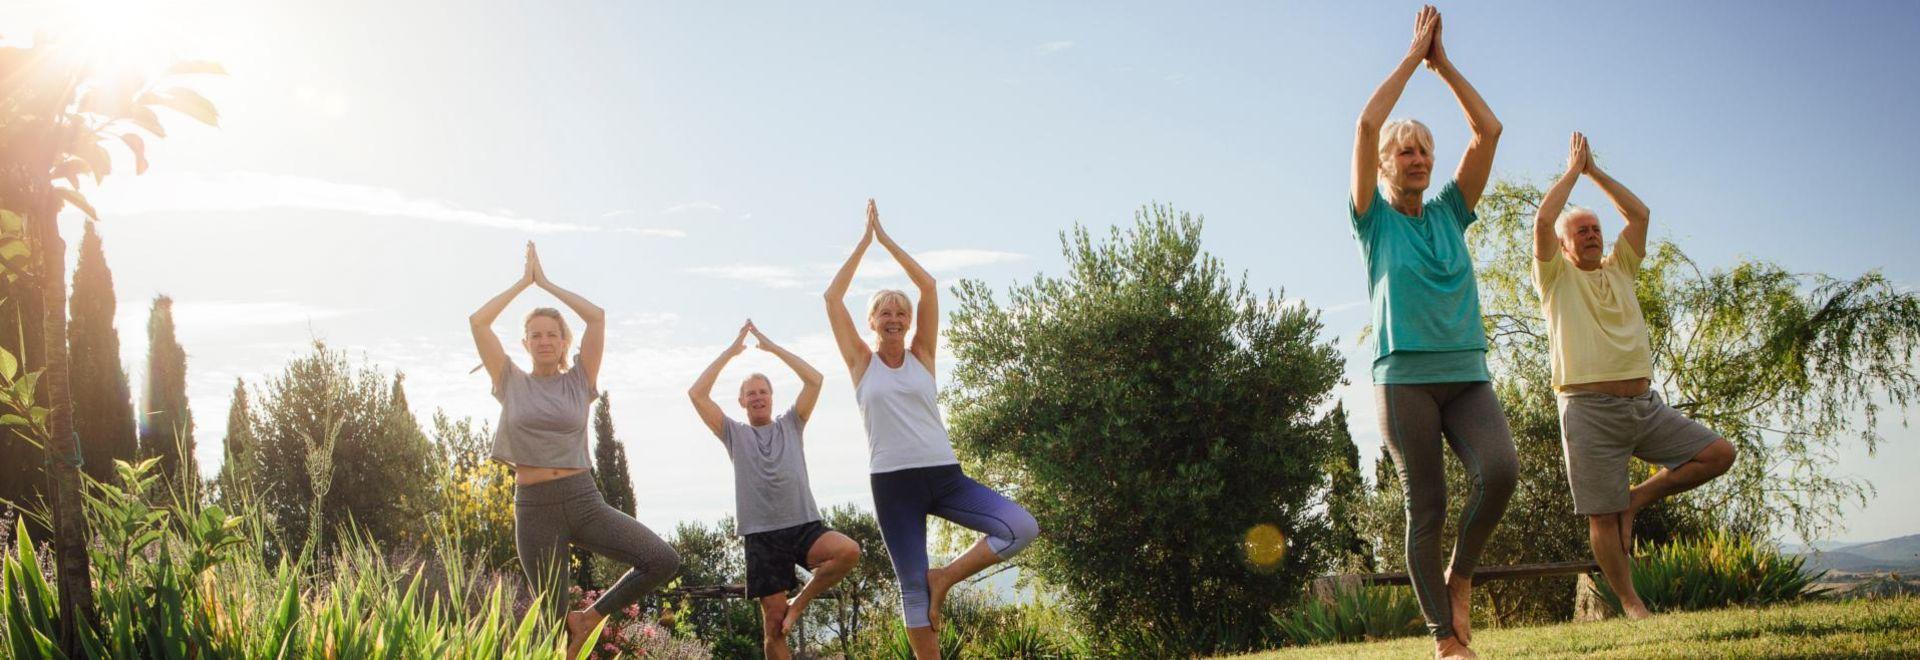 im-Freien-Yoga-praktizieren